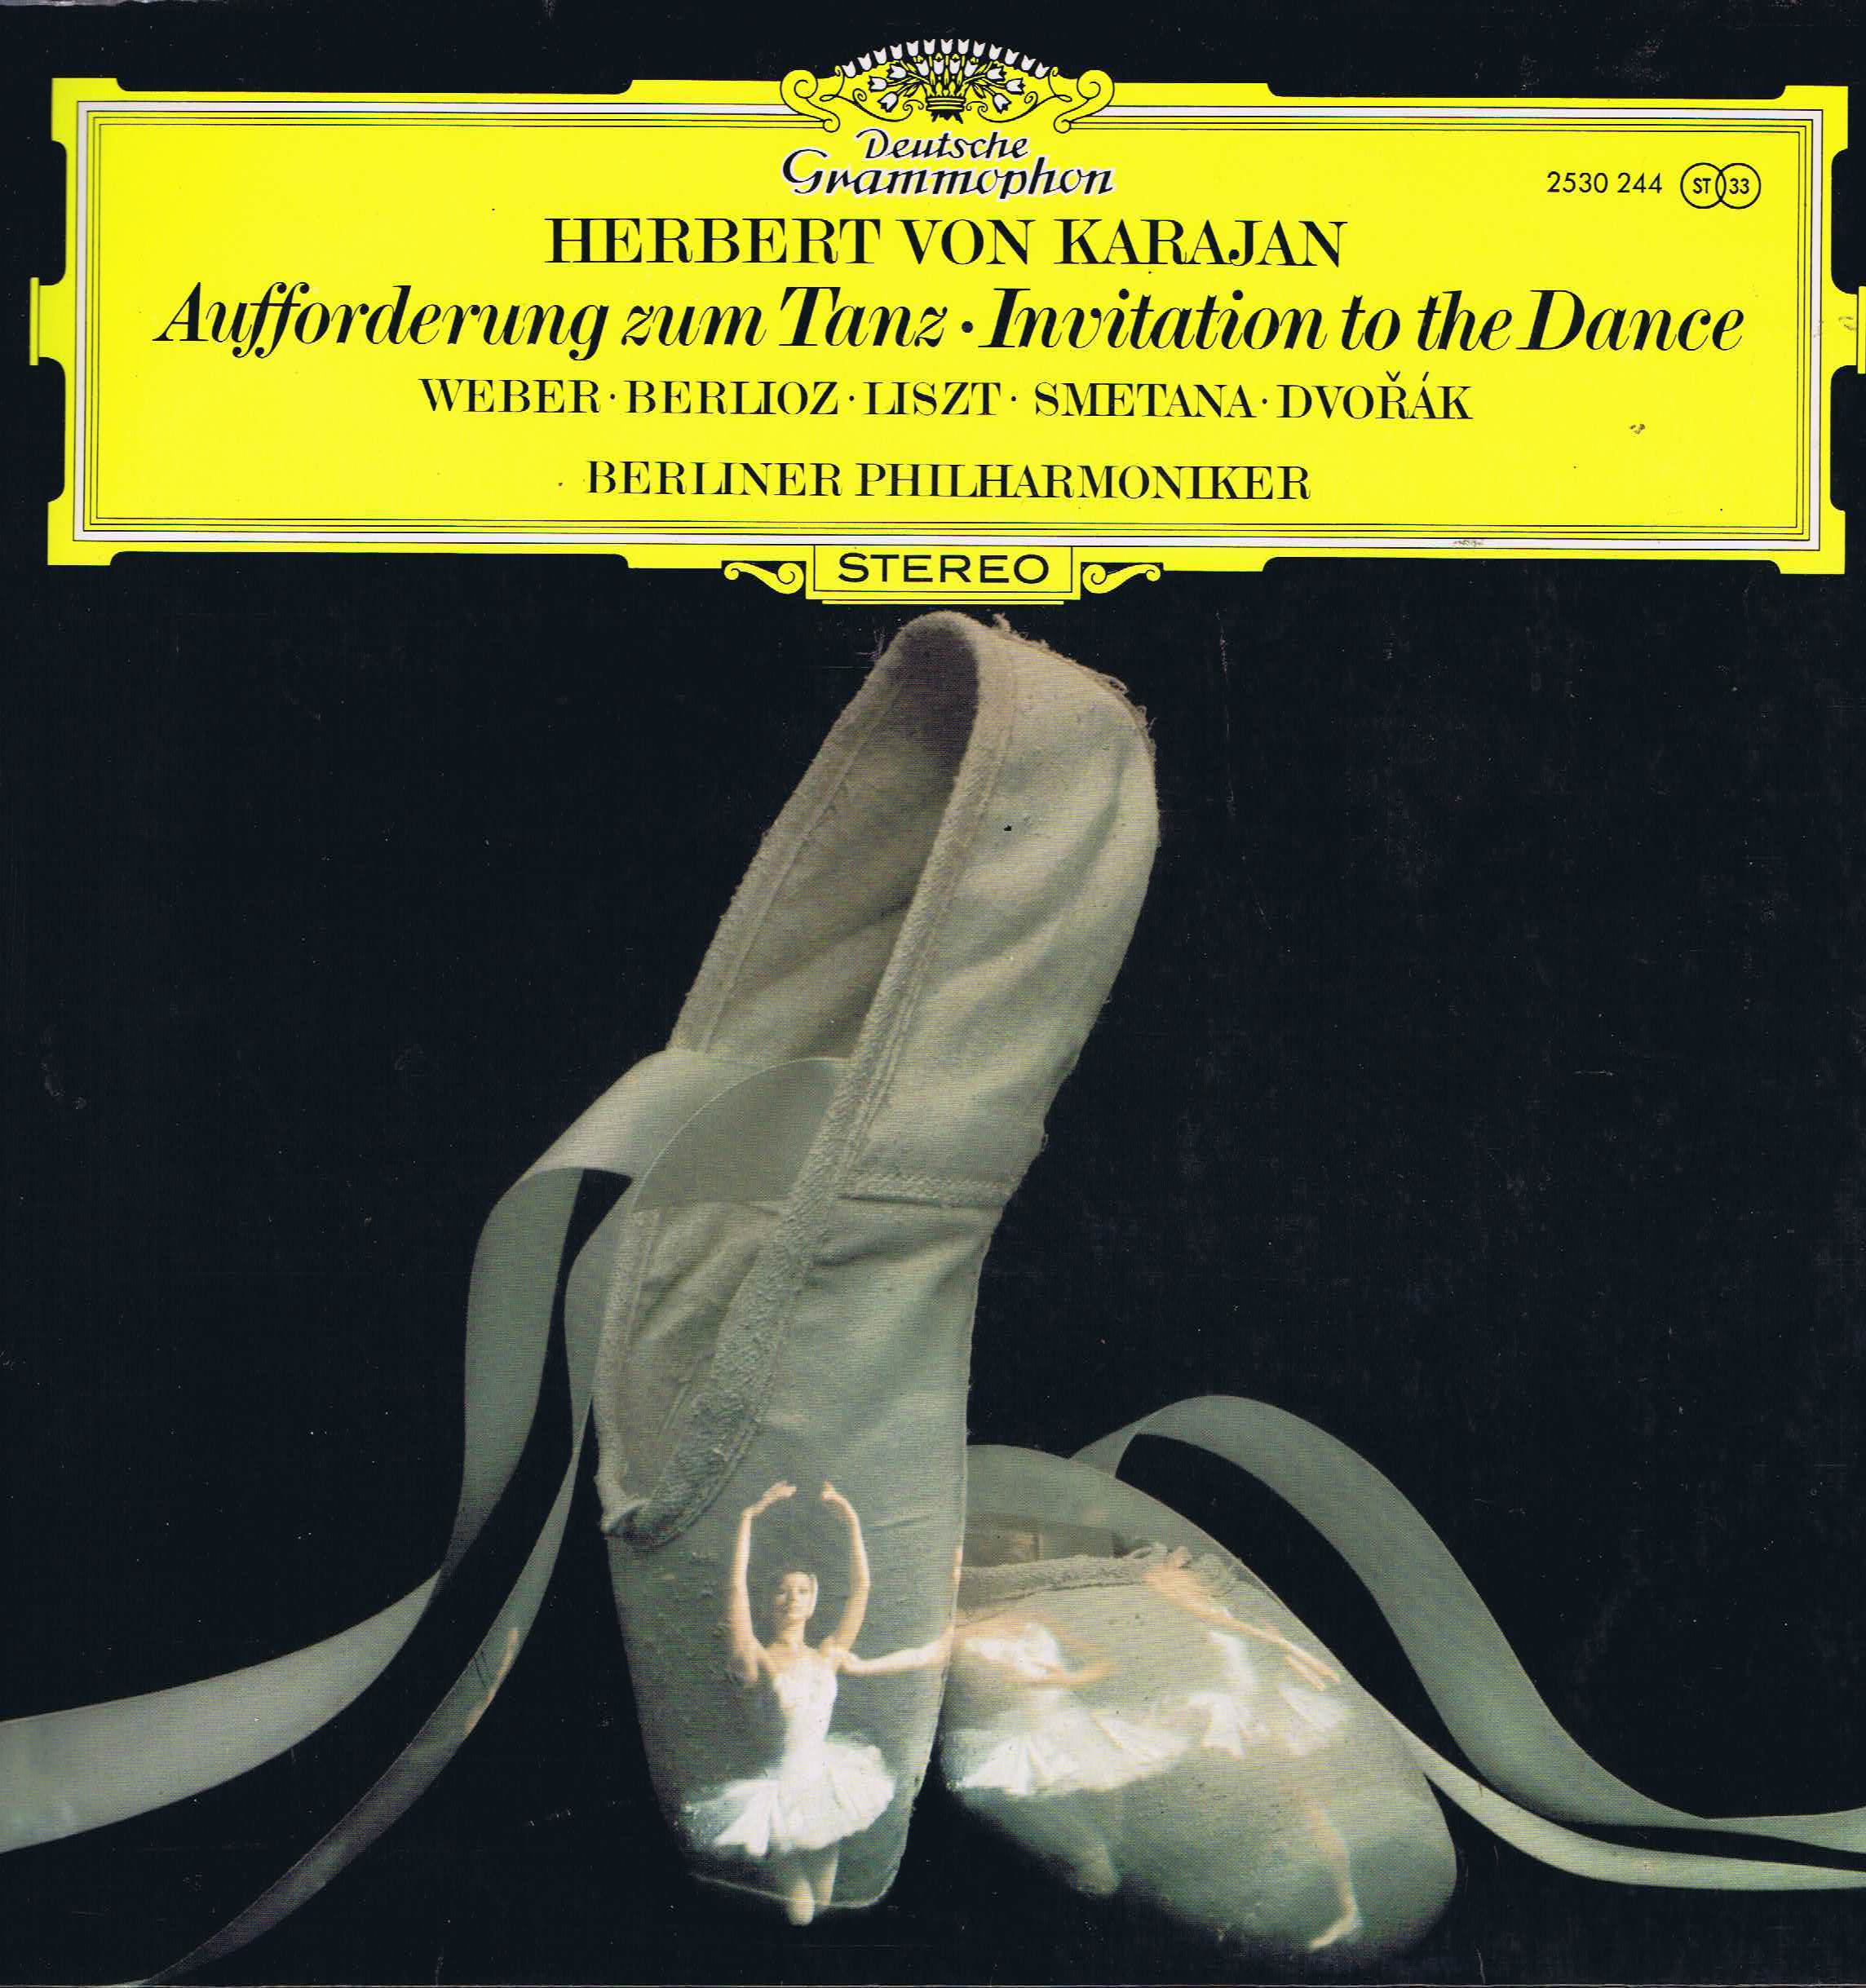 DGG 2530 244 Karajan Invitation To The Dance Weber Berlioz